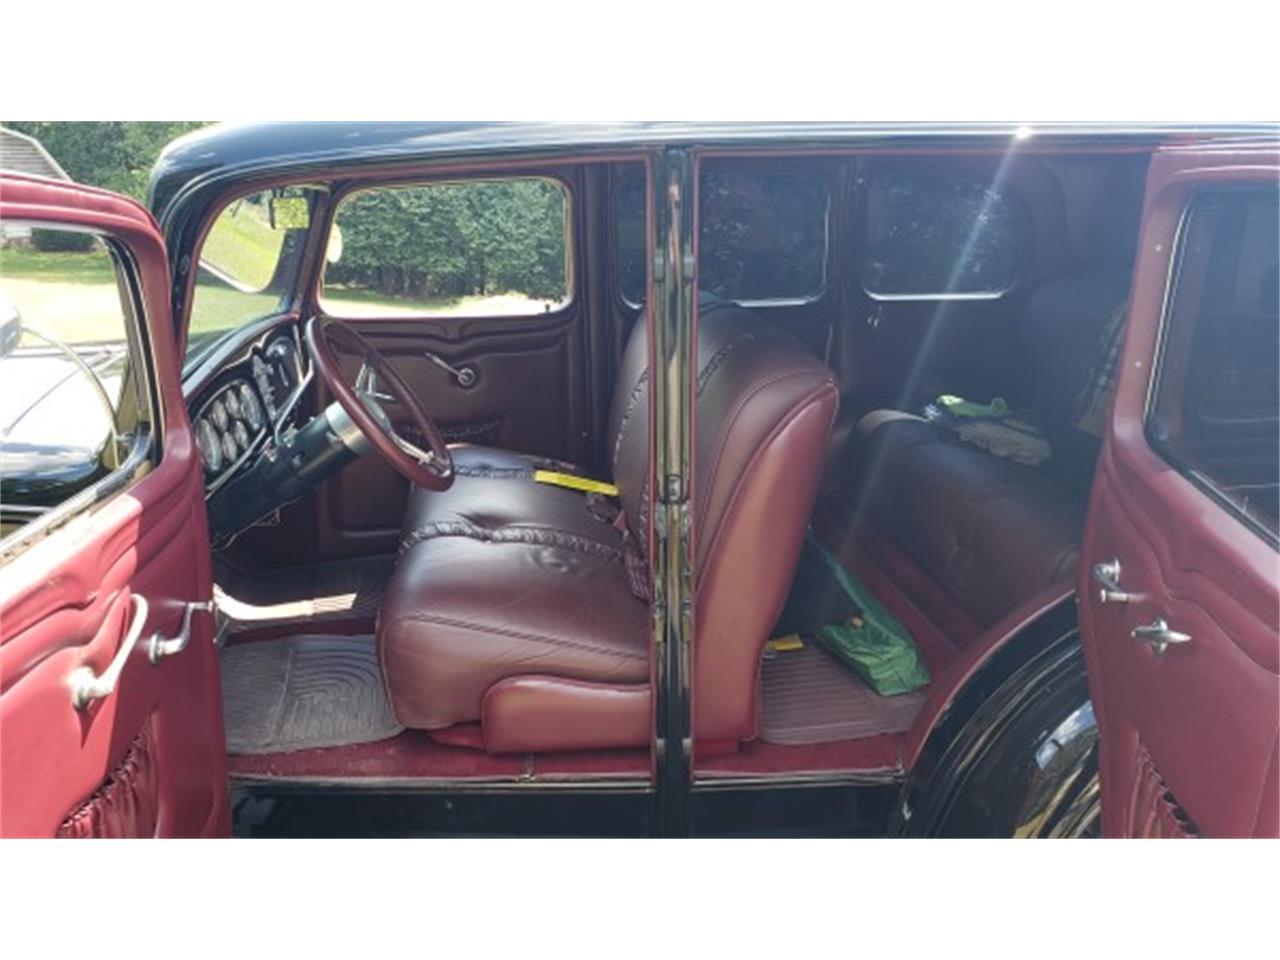 1933 Buick 4-Dr Sedan (CC-1275241) for sale in Suwanee, Georgia